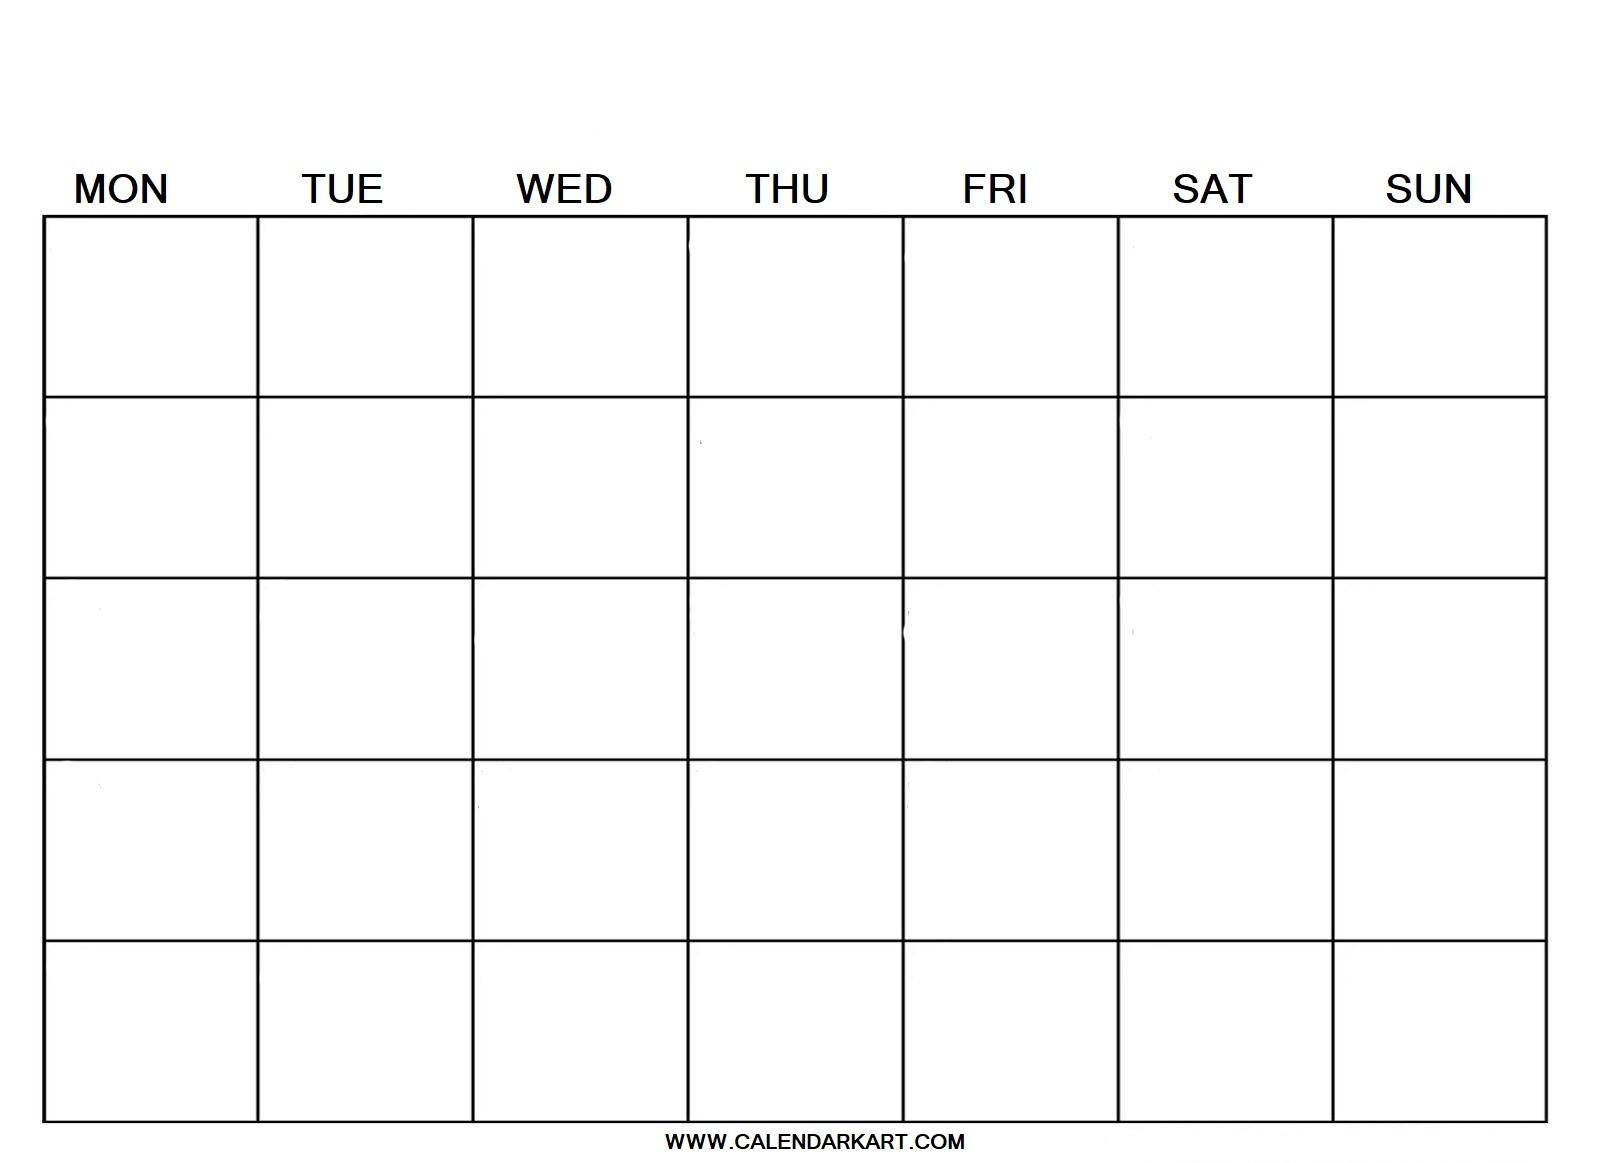 2020 Free Printable Blank Calendar Template » Calendarkart-Printable Blank Calendar Template With Notes